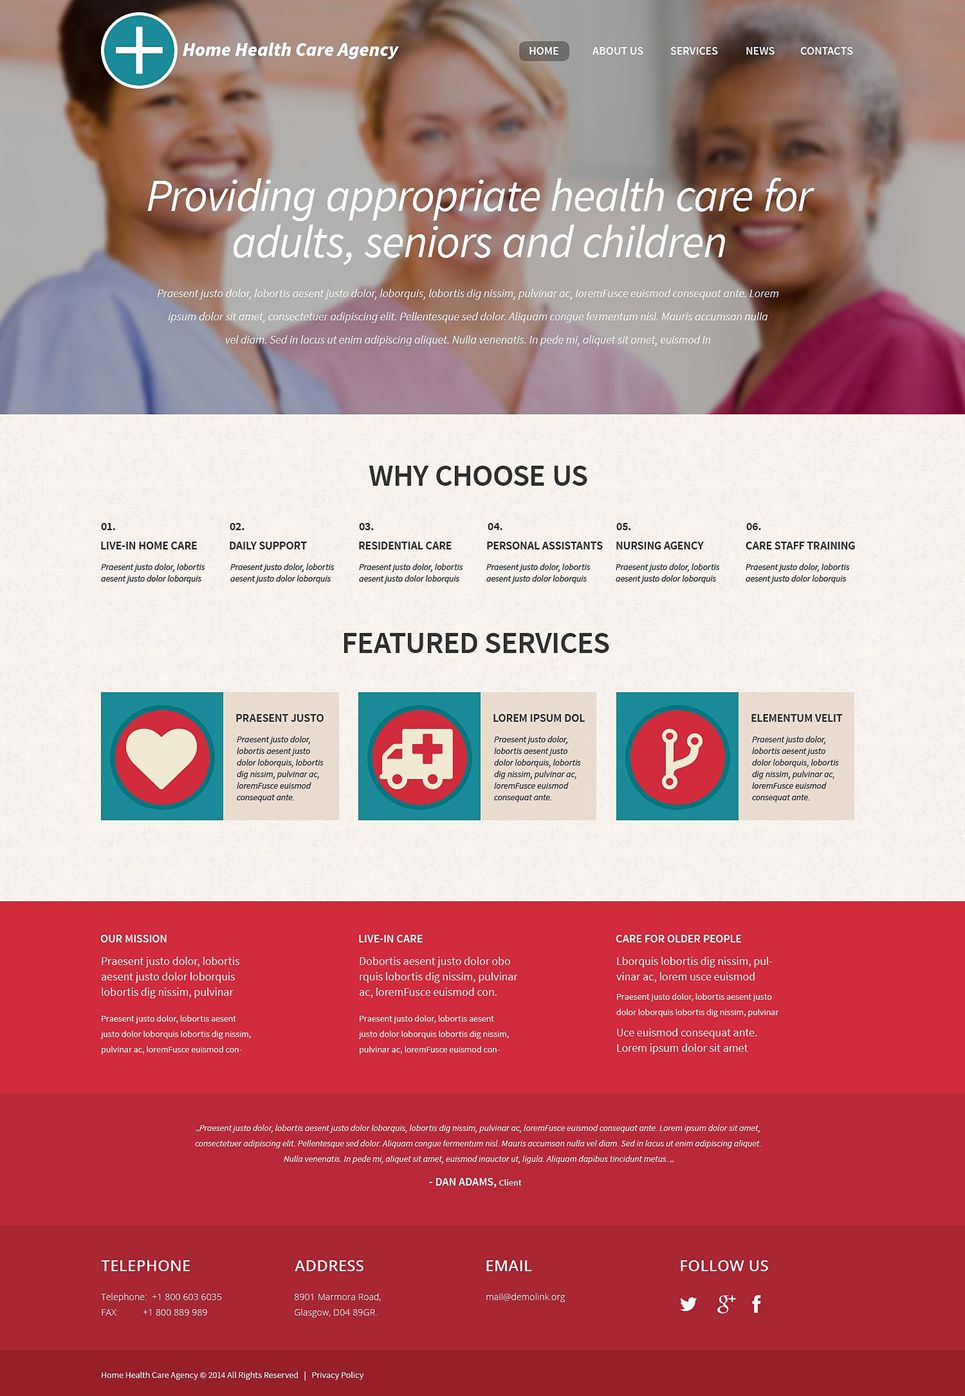 Healthcare Professionals Wordpress Theme 52371 Professional Wordpress Themes Home Health Care Care Agency